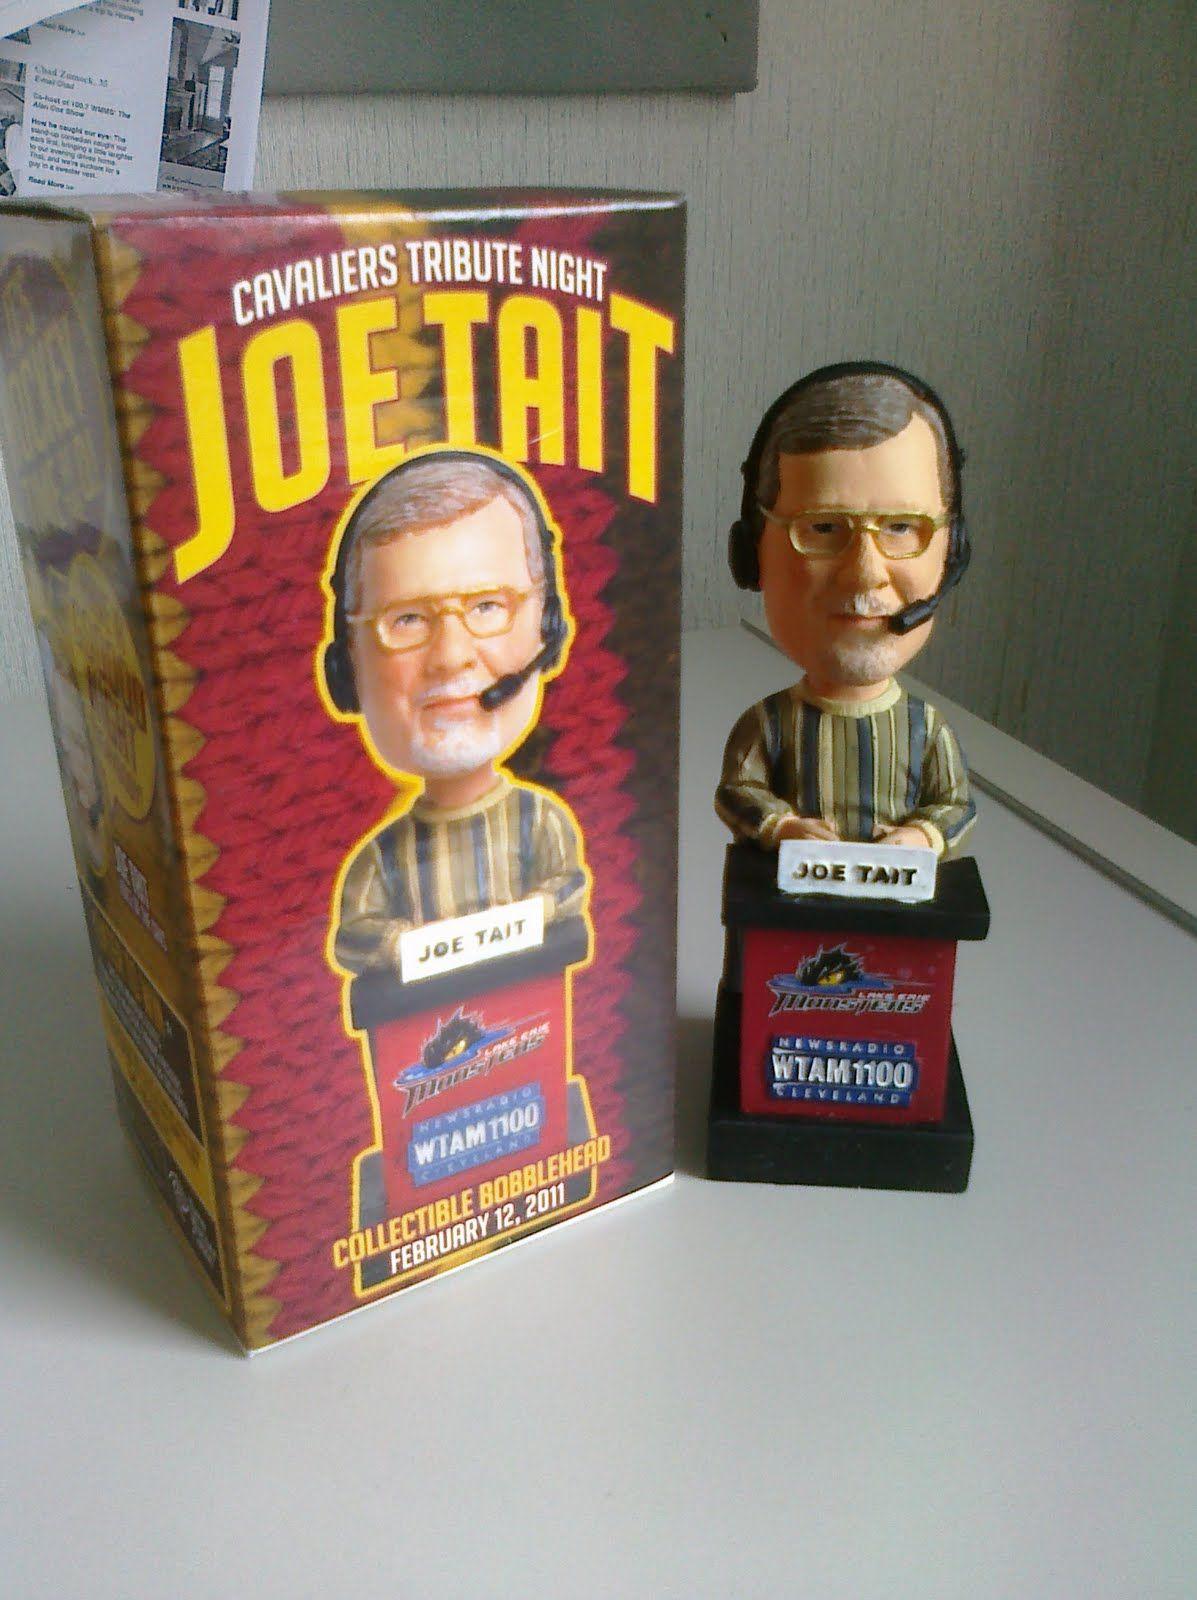 cleveland cavaliers bobbleheads - Joe Tait | CLEVELAND